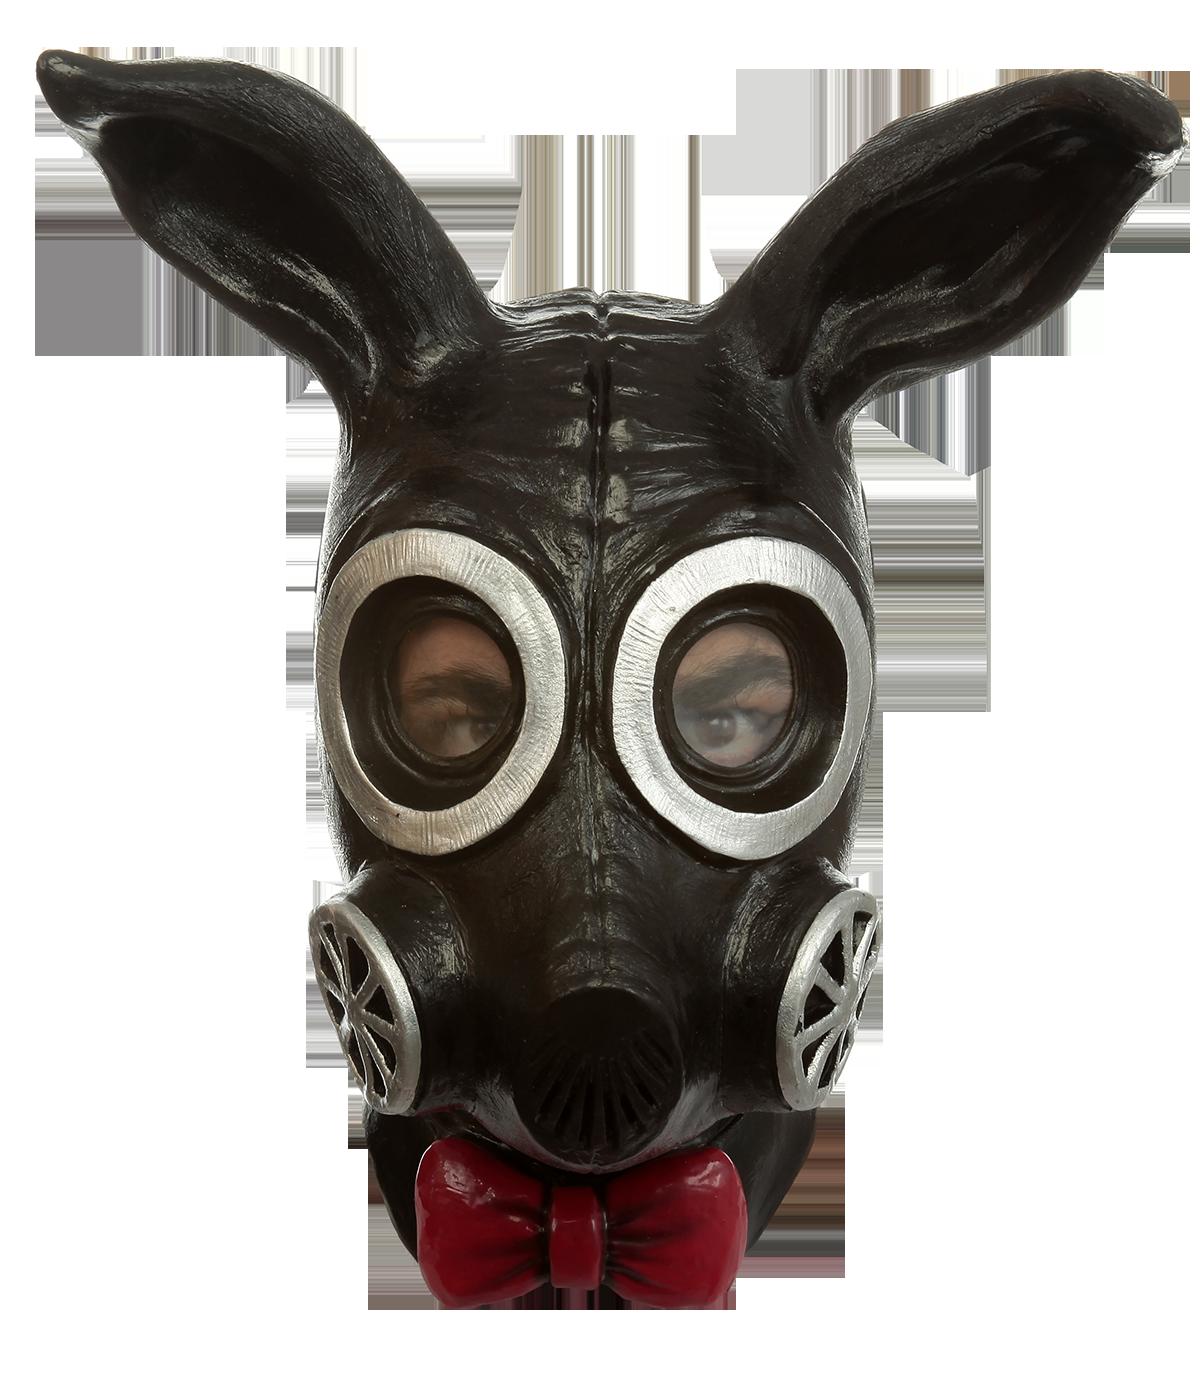 Bunny Gas Mask ⠀⠀⠀⠀⠀⠀⠀